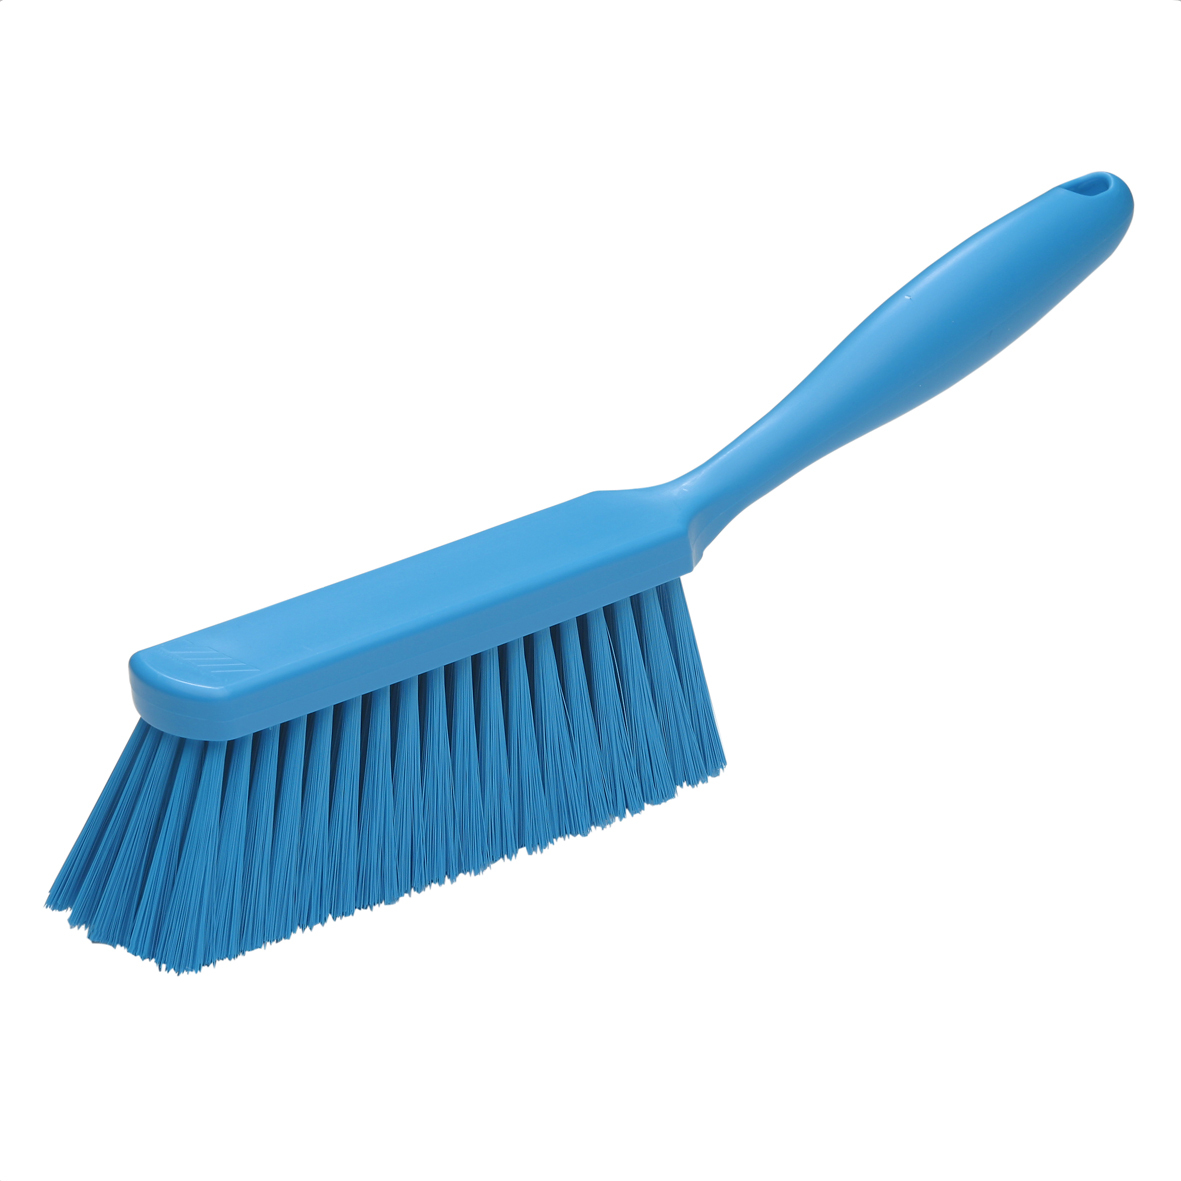 Kiowa Ltd Vikan Medium Hand Brush 350mm Blue Kiowa